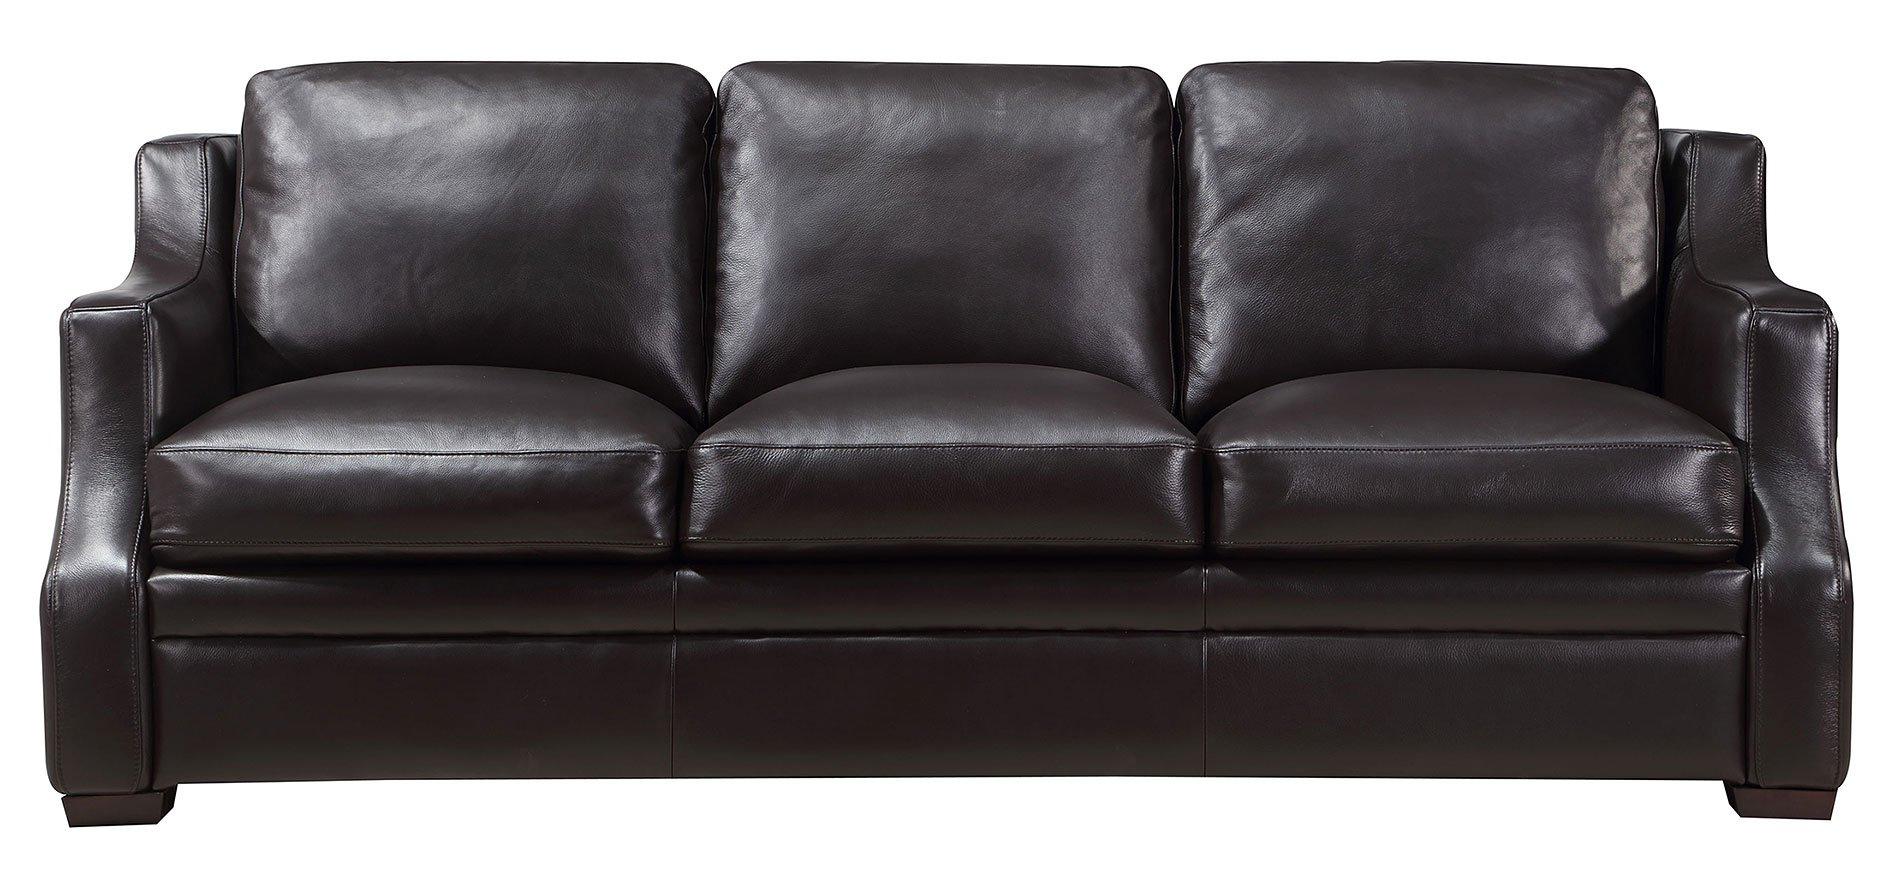 Grandview Leather Sofa (Espresso)